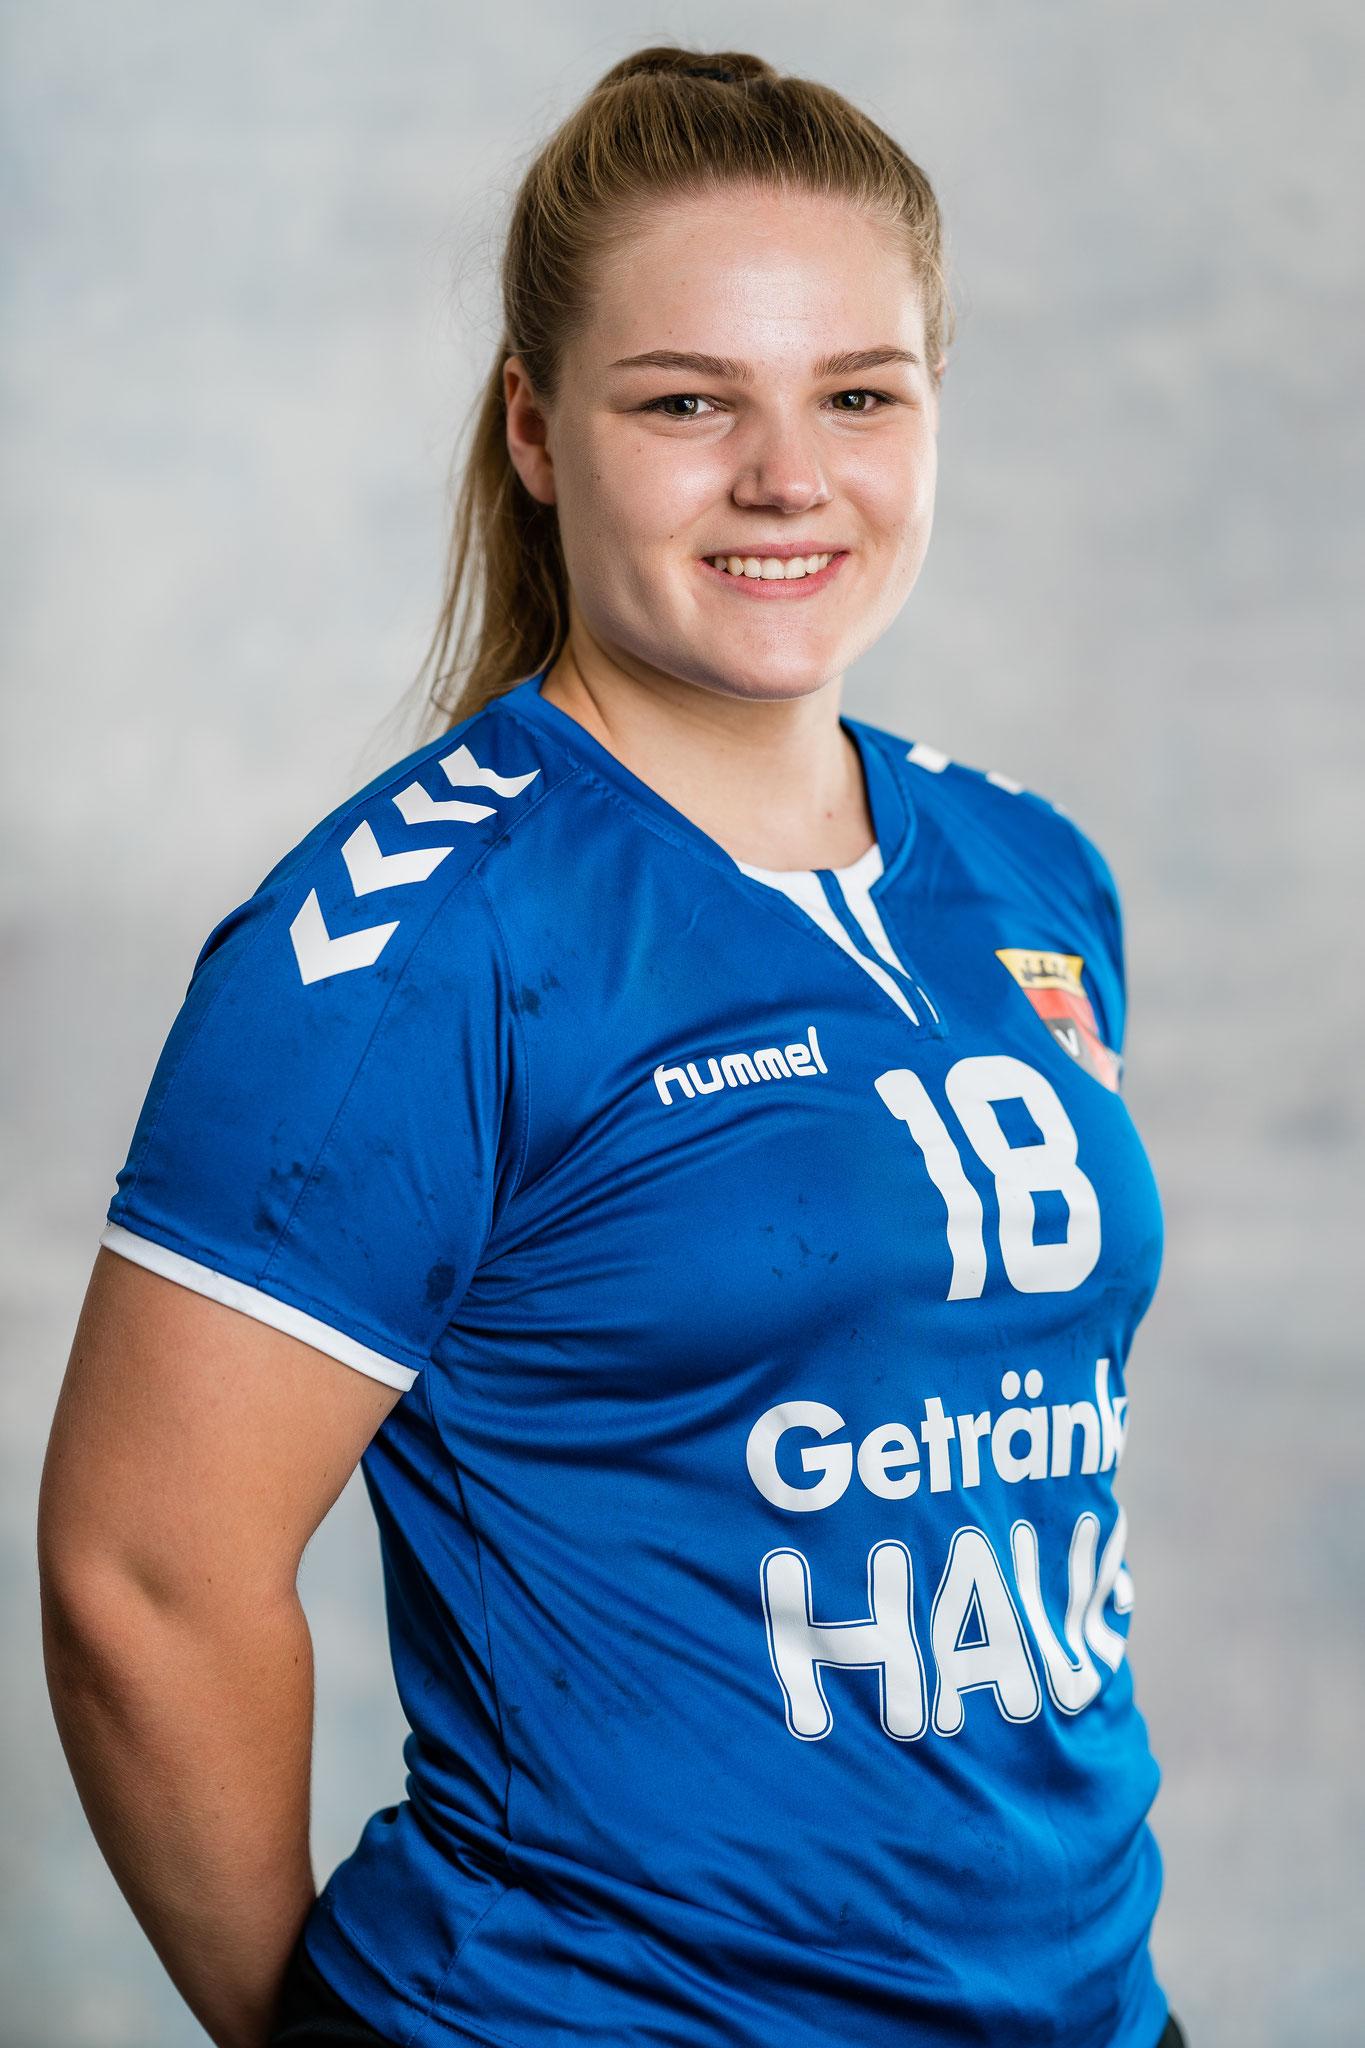 Jana Erfle